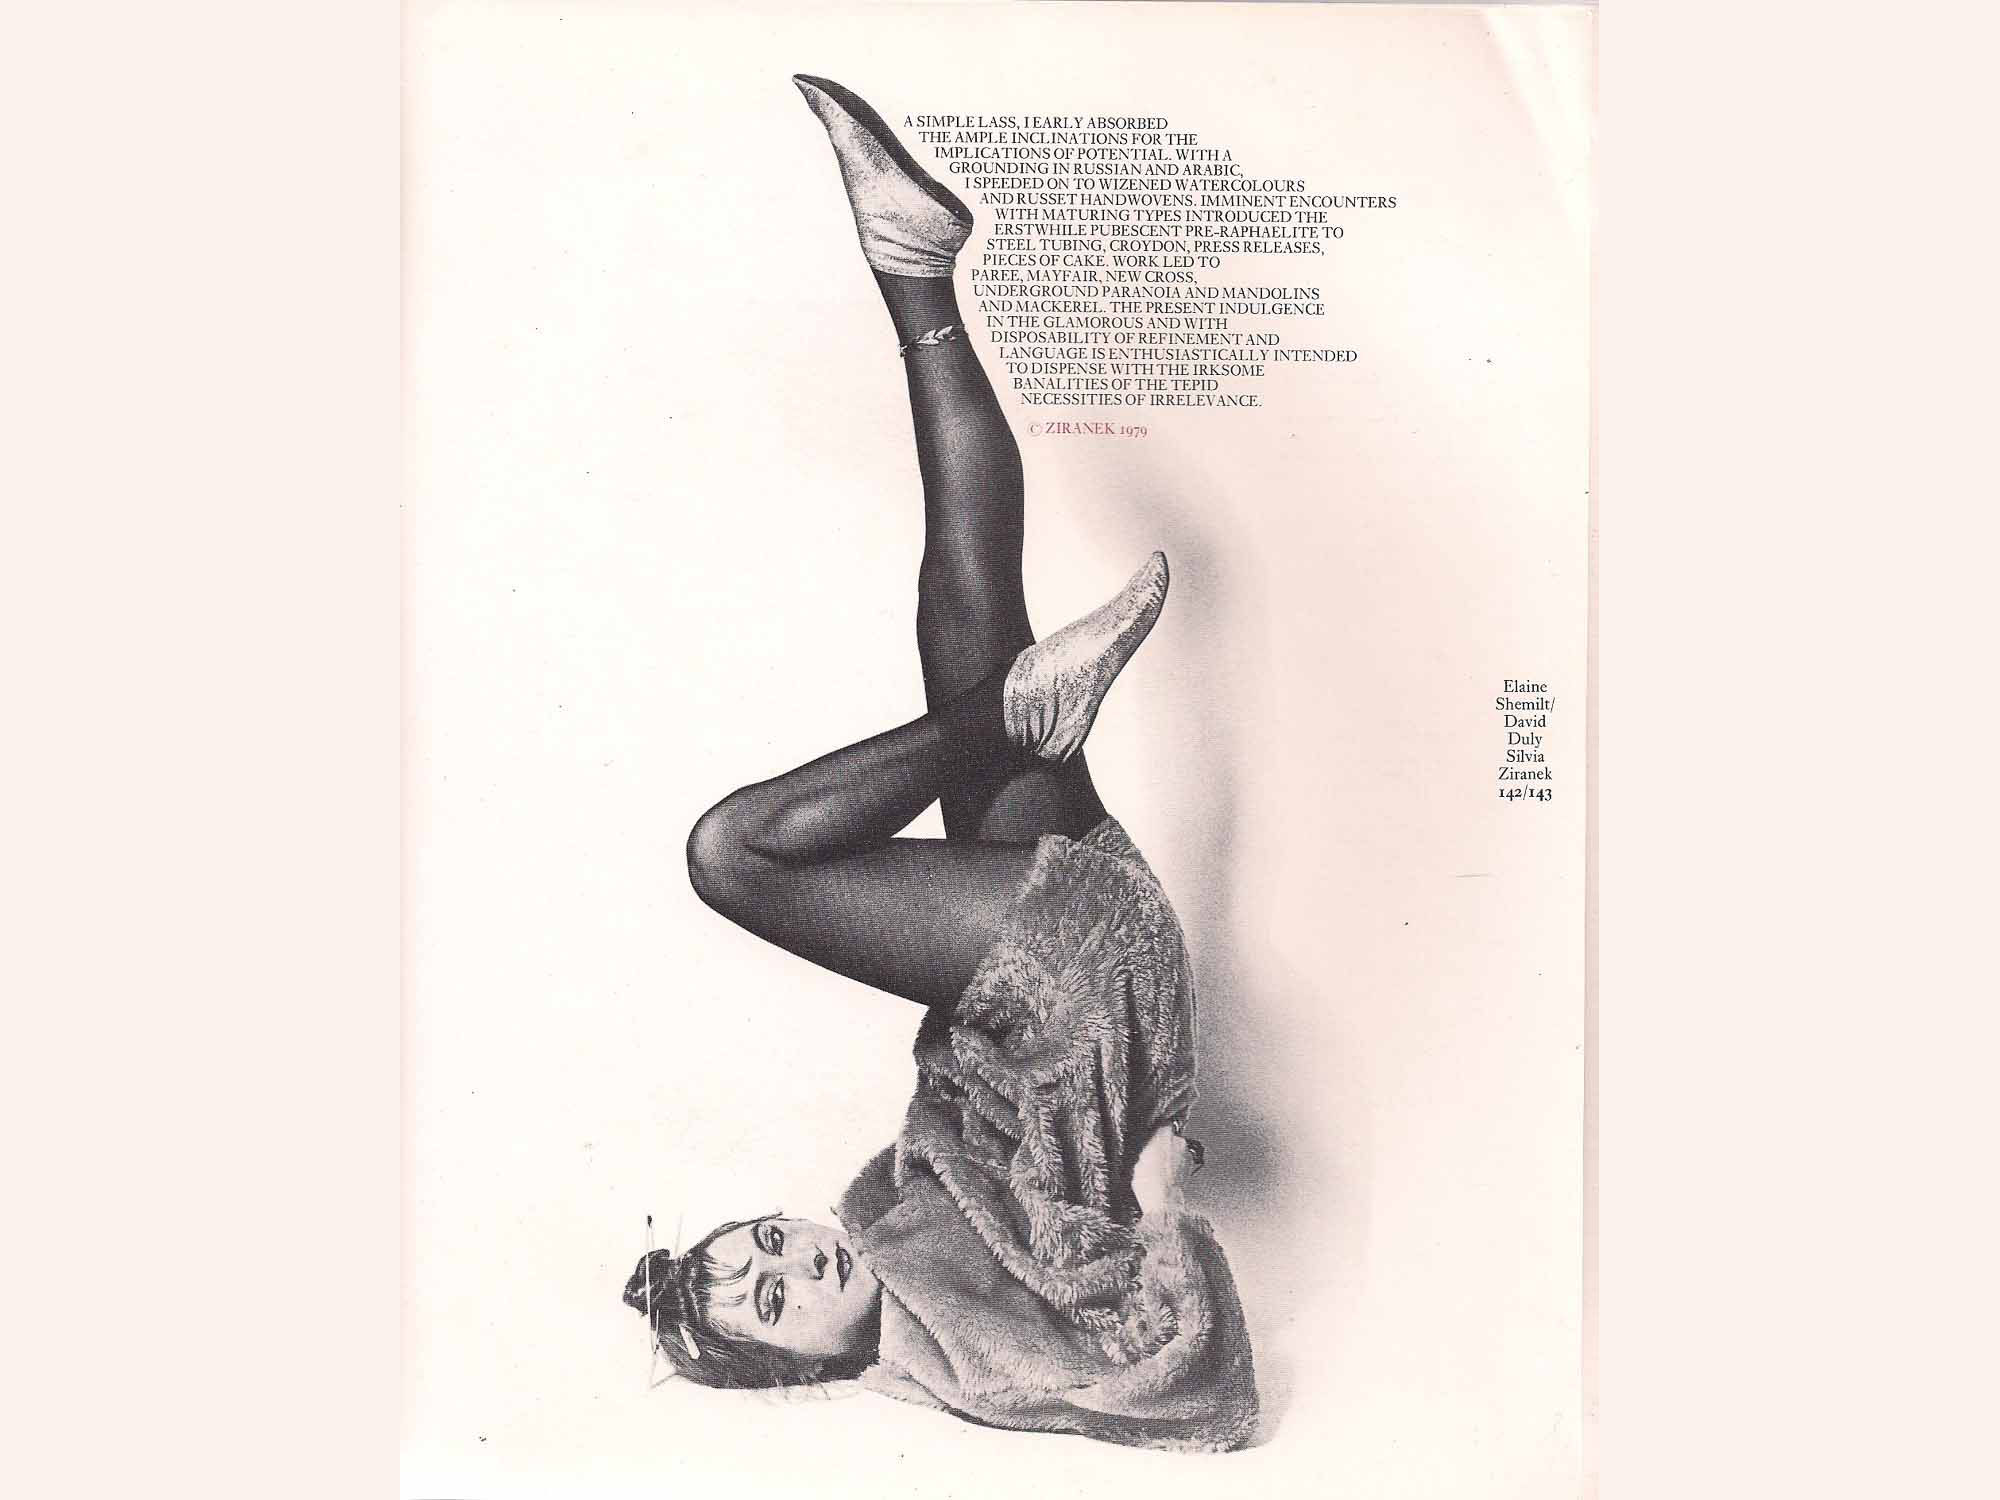 Silvia Ziranek, Chili Con Cardboard A Contemporary Triptych, (1979). Hayward Annual, London.